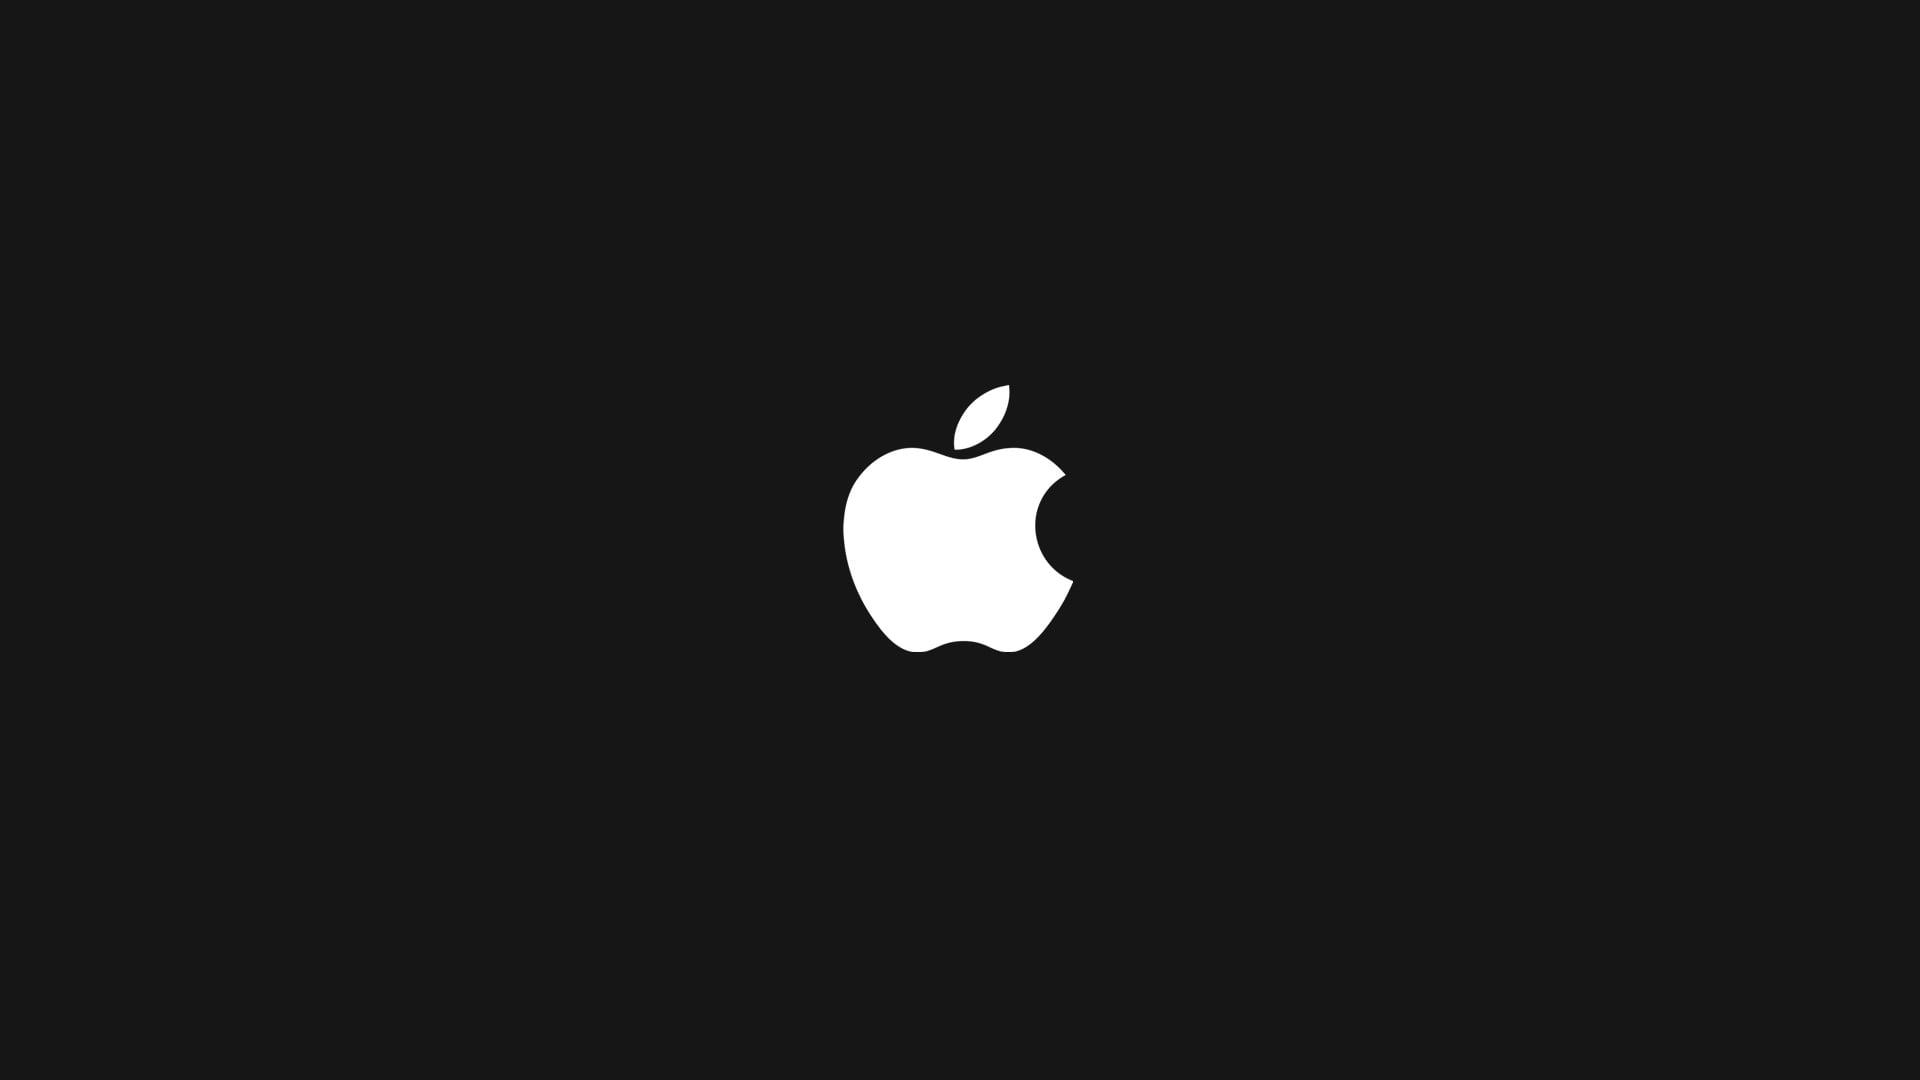 Apple Company logo HD wallpaper.